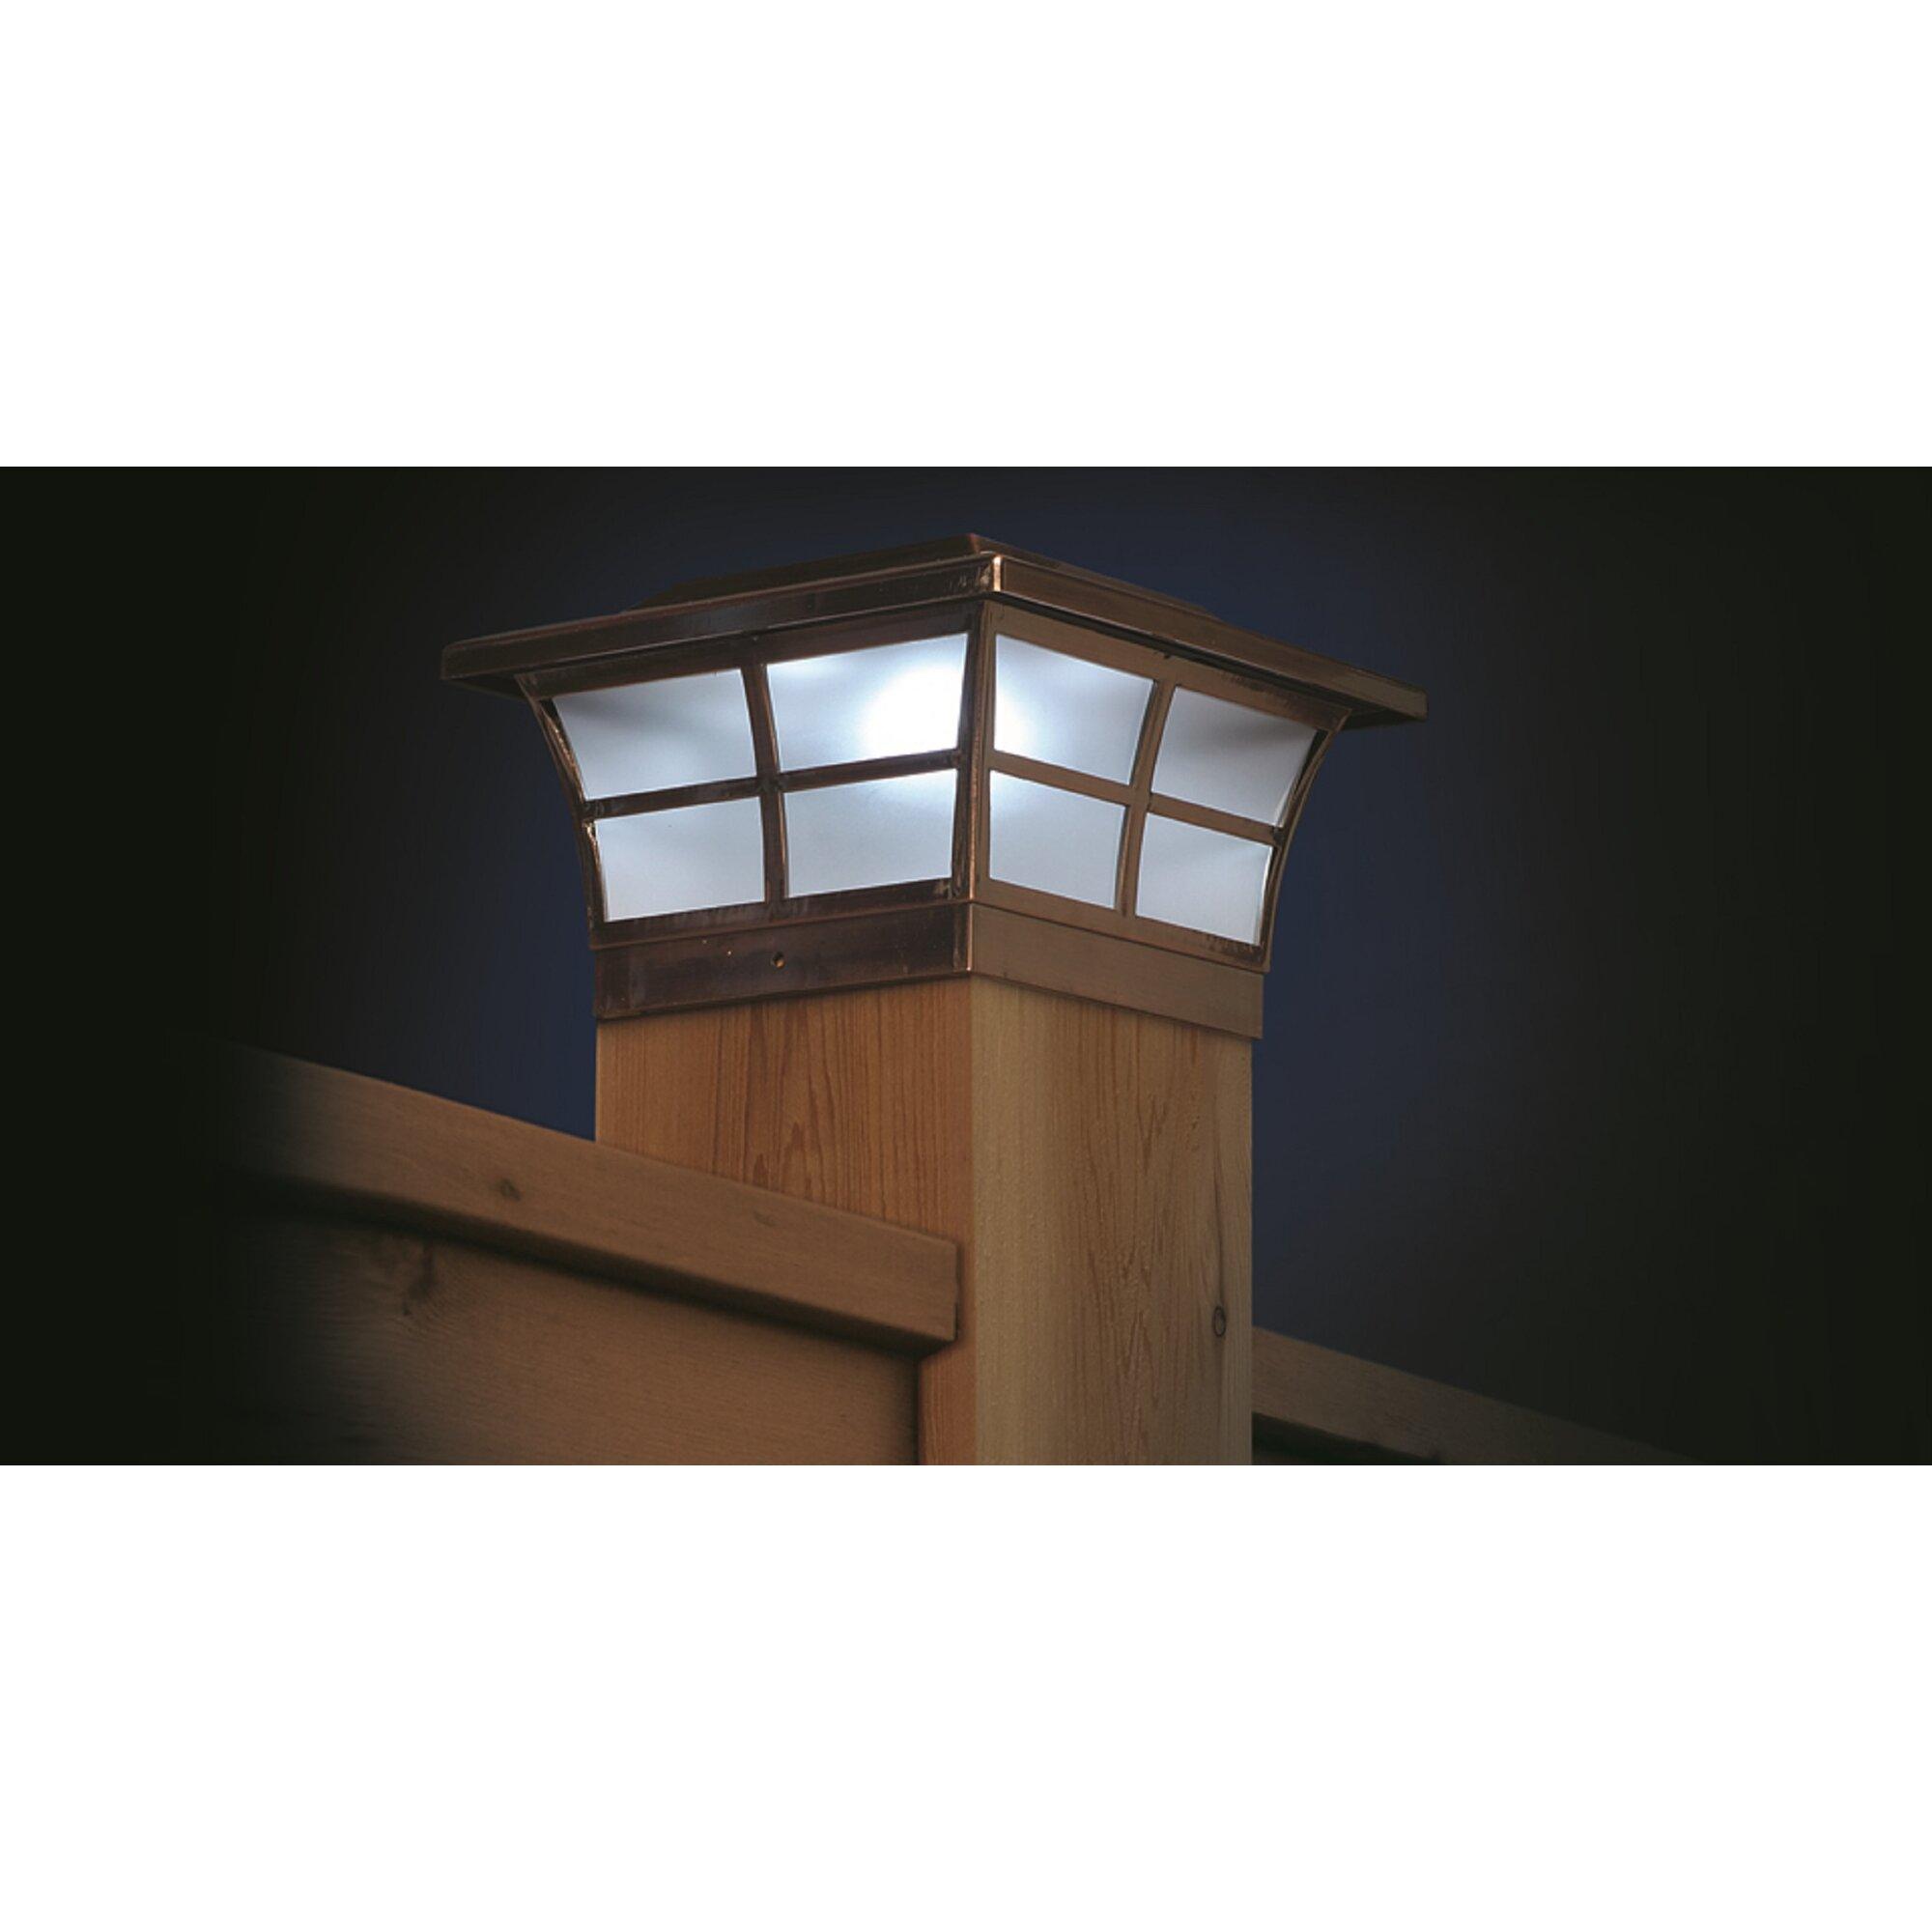 classy caps solar 2 light fence post cap reviews wayfair. Black Bedroom Furniture Sets. Home Design Ideas